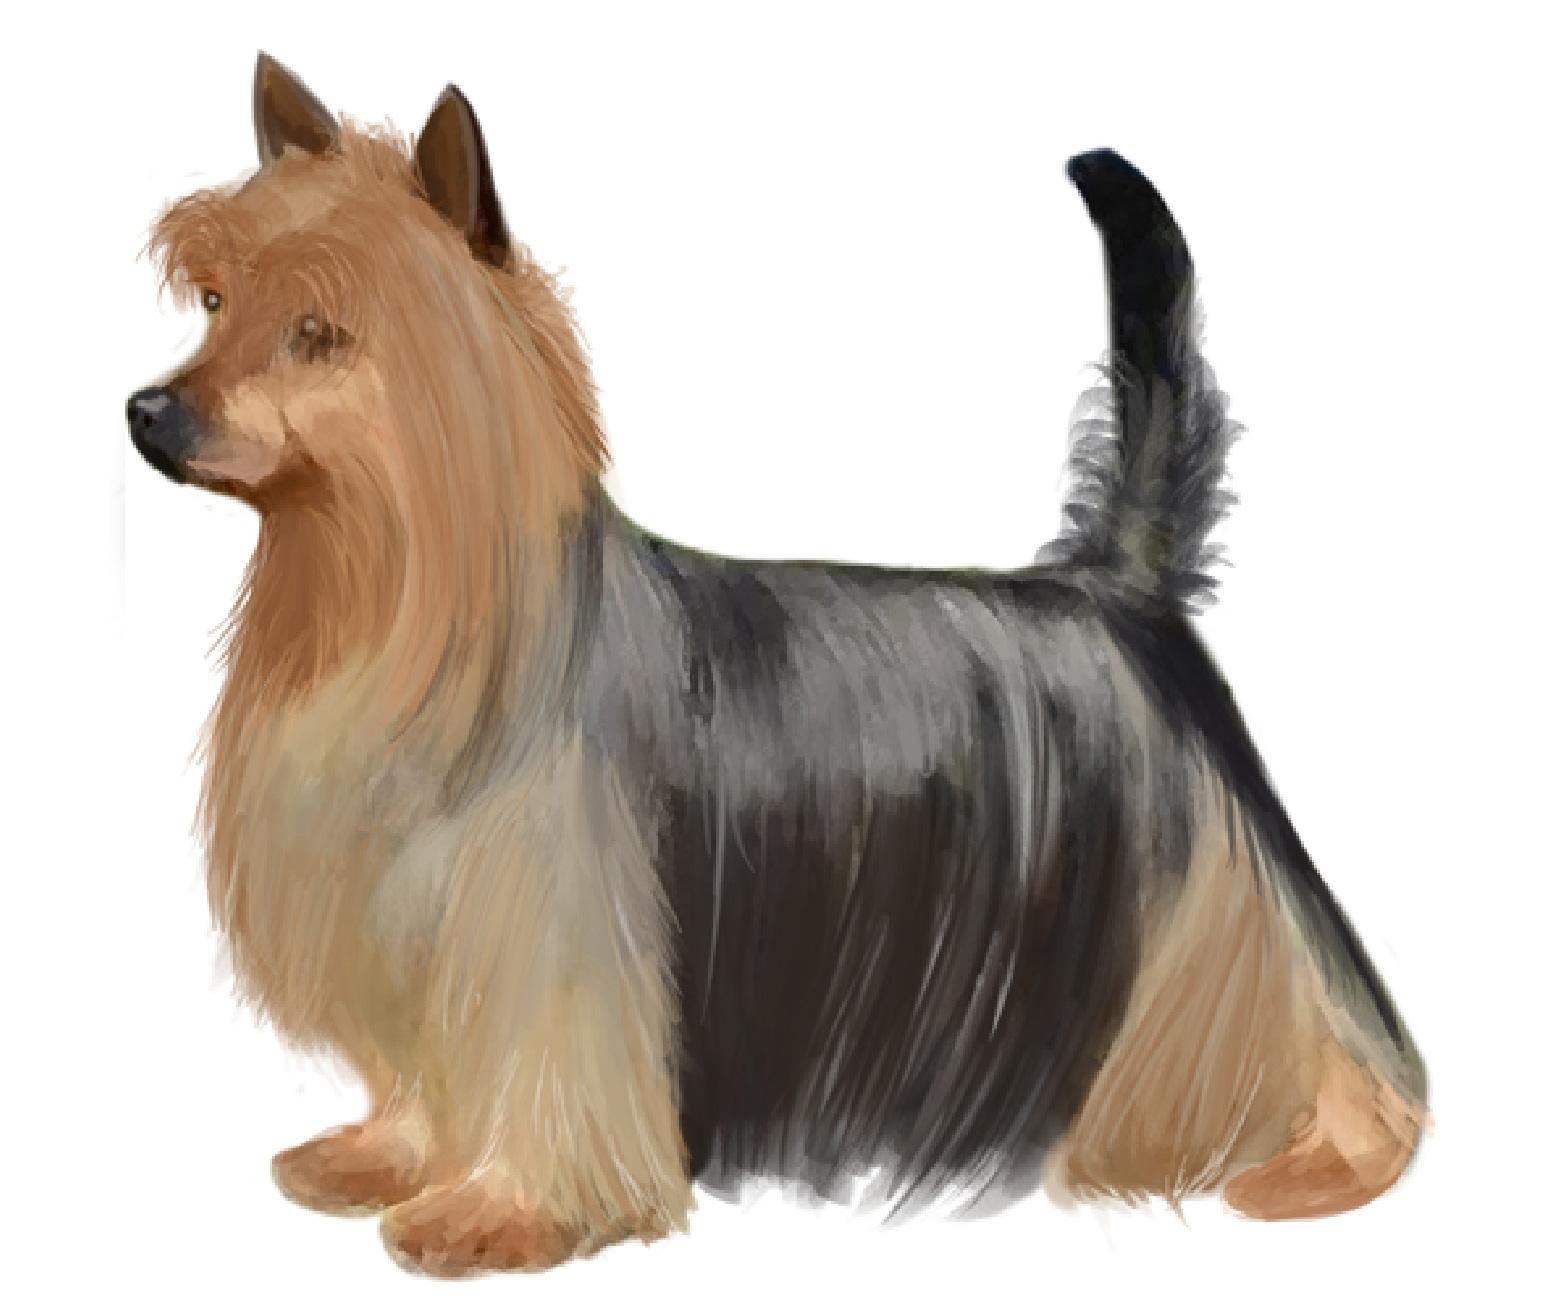 Australian Silky Terrier set